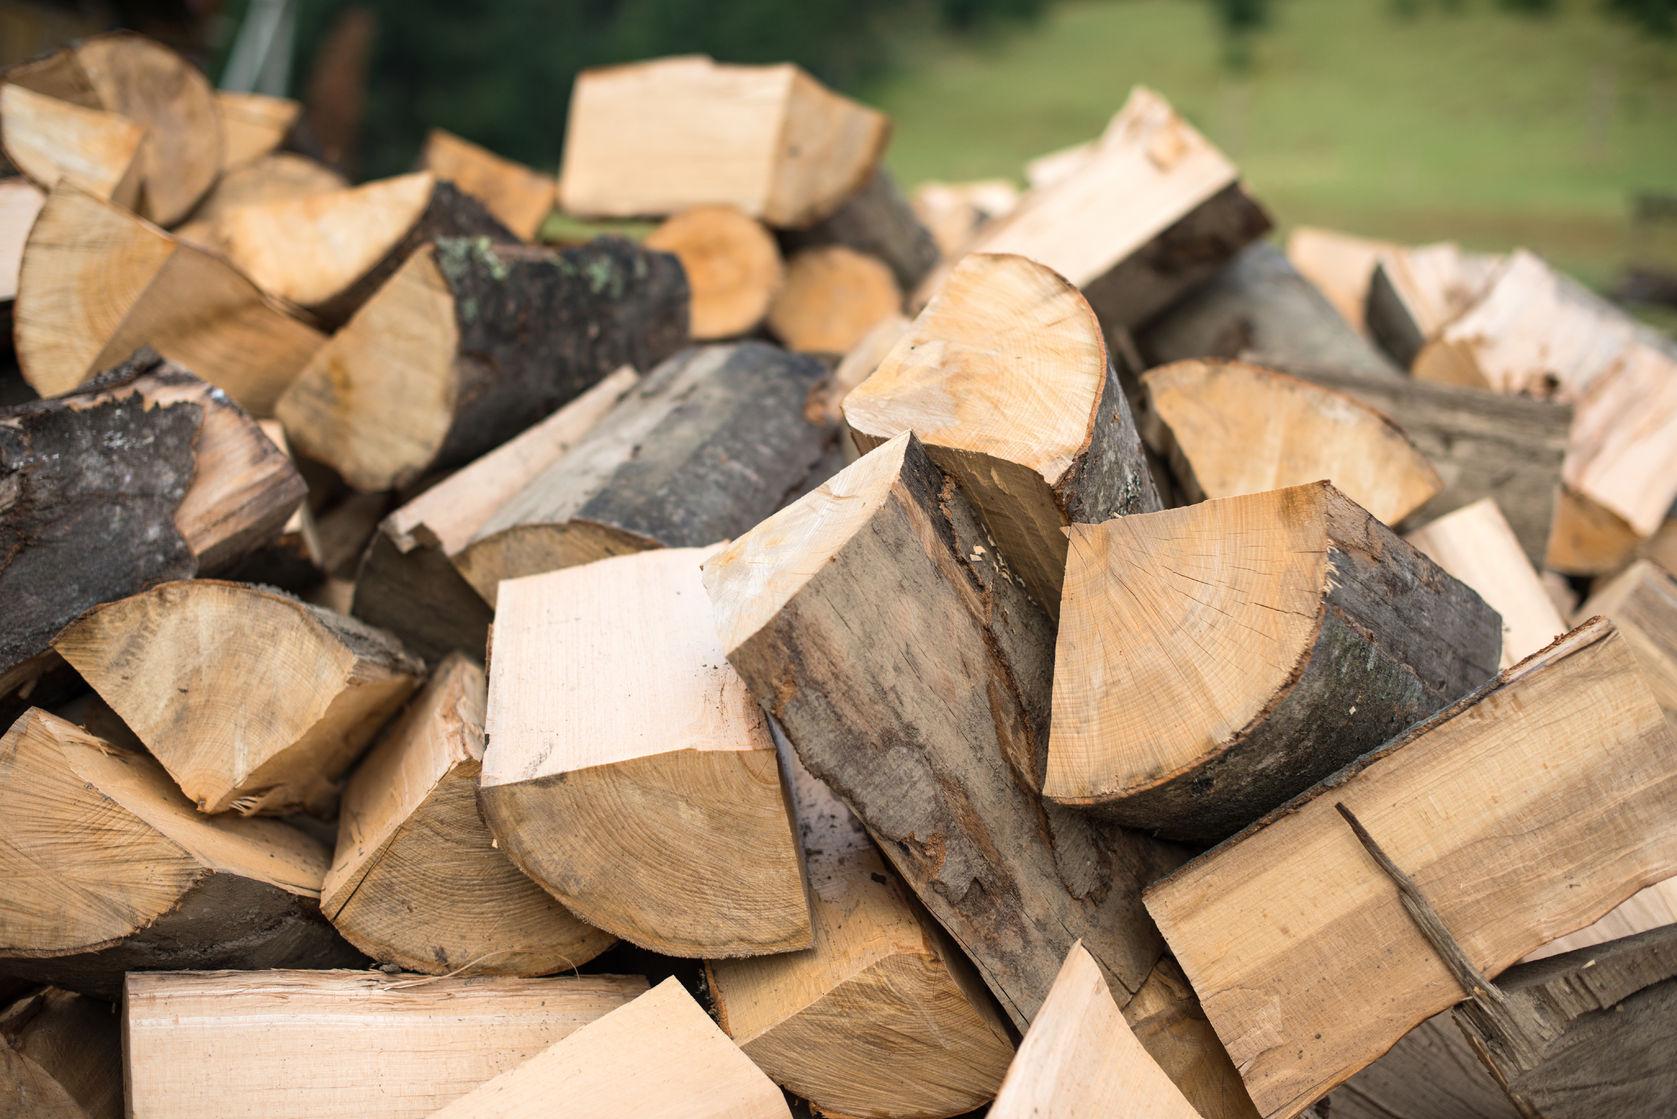 45276813 – firewood